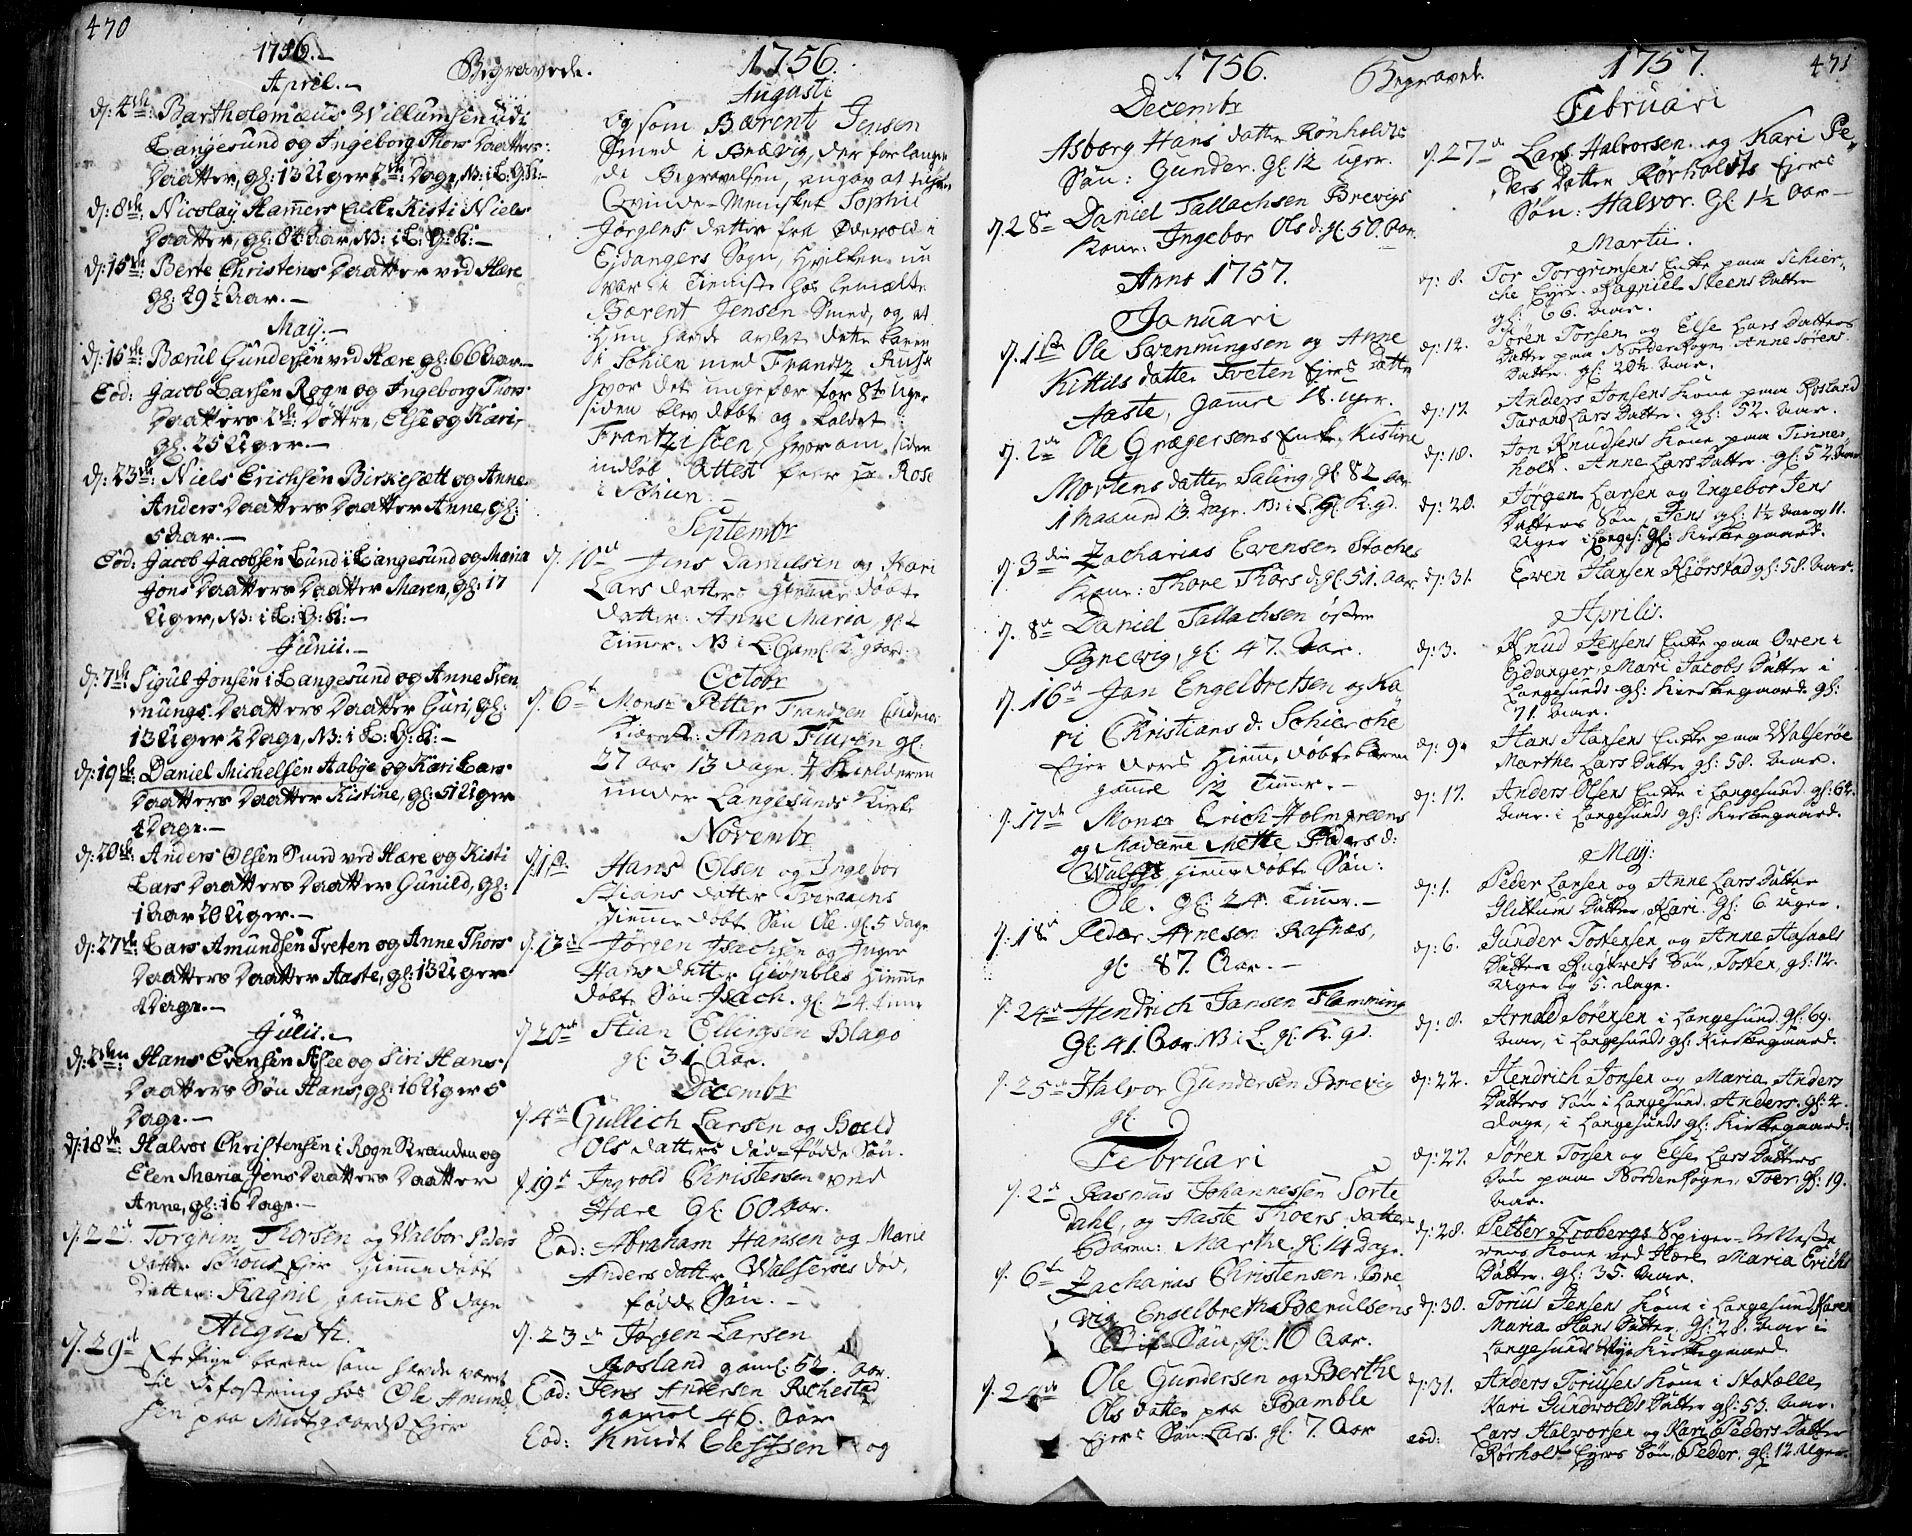 SAKO, Bamble kirkebøker, F/Fa/L0001: Ministerialbok nr. I 1, 1702-1774, s. 470-471